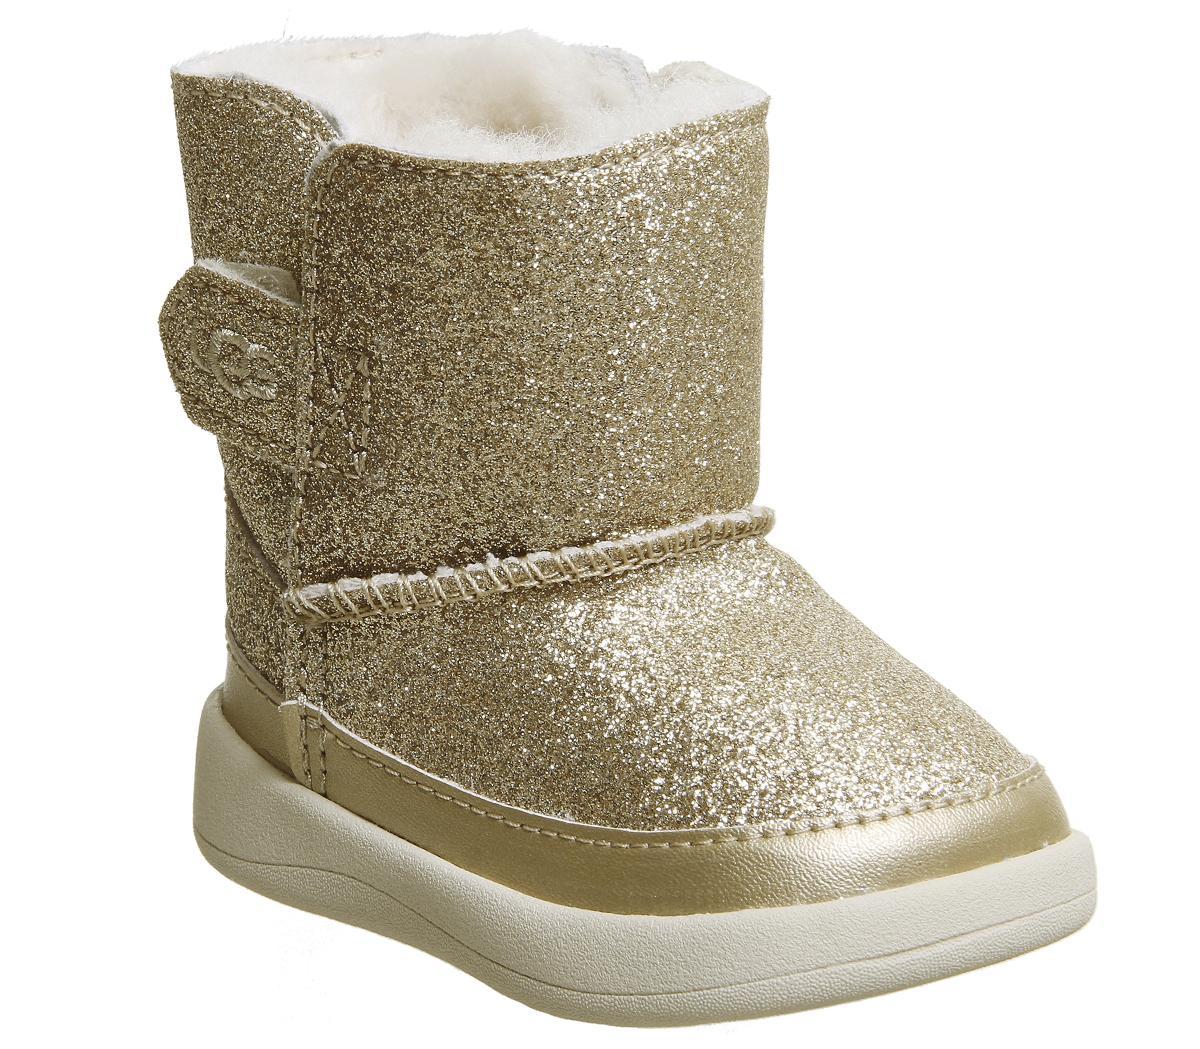 Keelan Boots